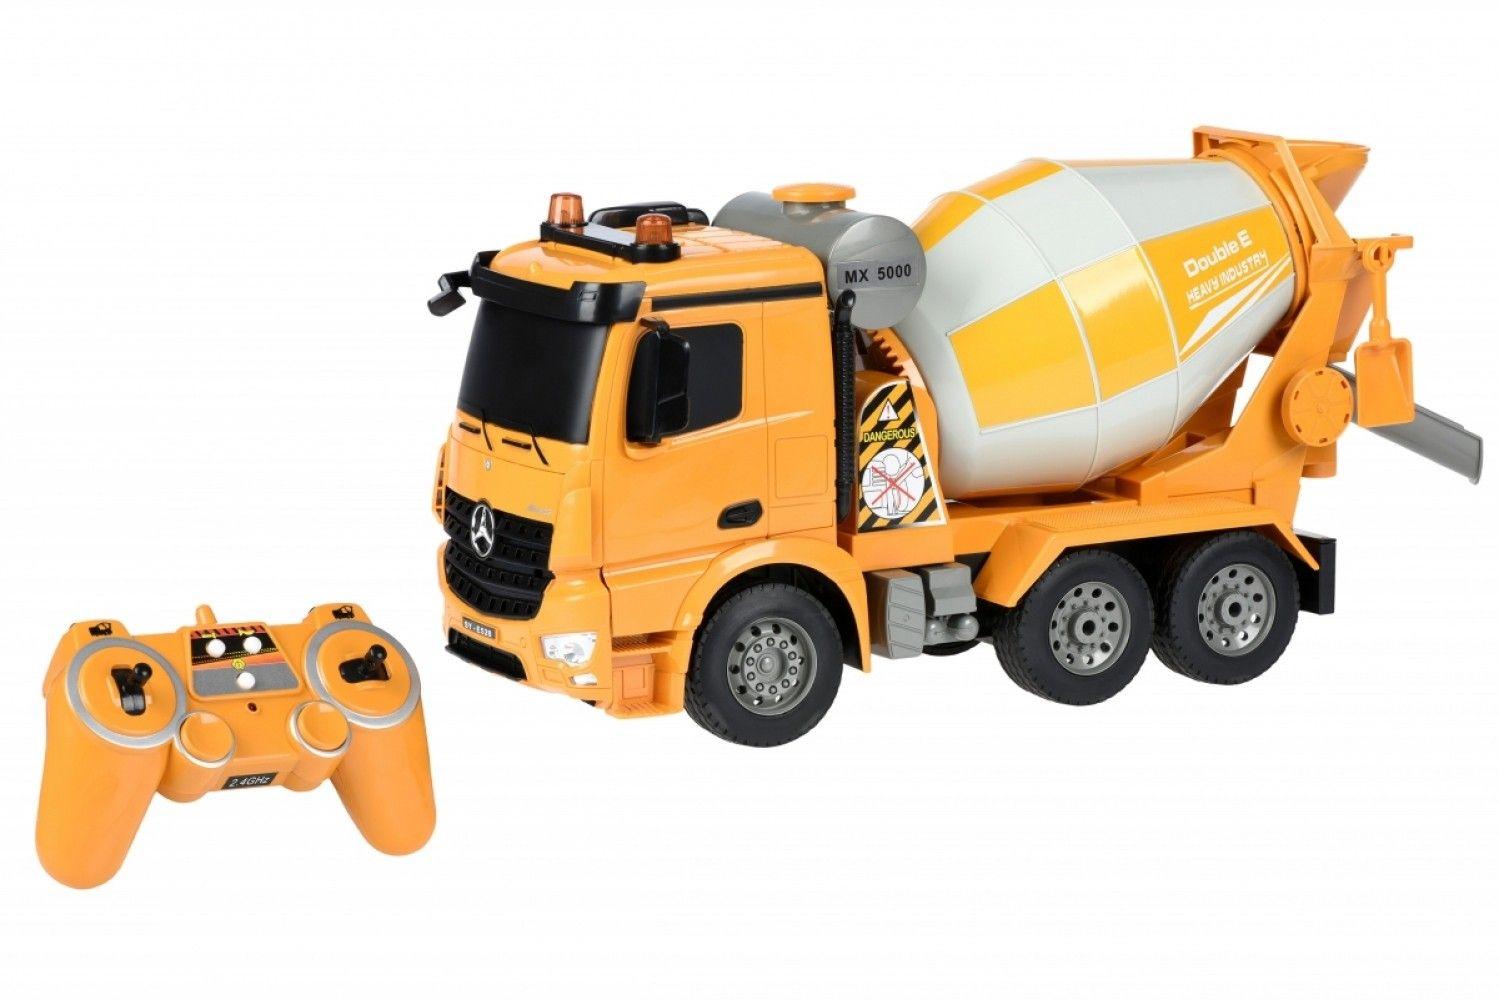 Купить Игрушечные машинки и техника, Машинка на р/у 3 в 1 Same Toy Бетономешалка Mercedes-Benz 1:20 (E528-003) Yellow